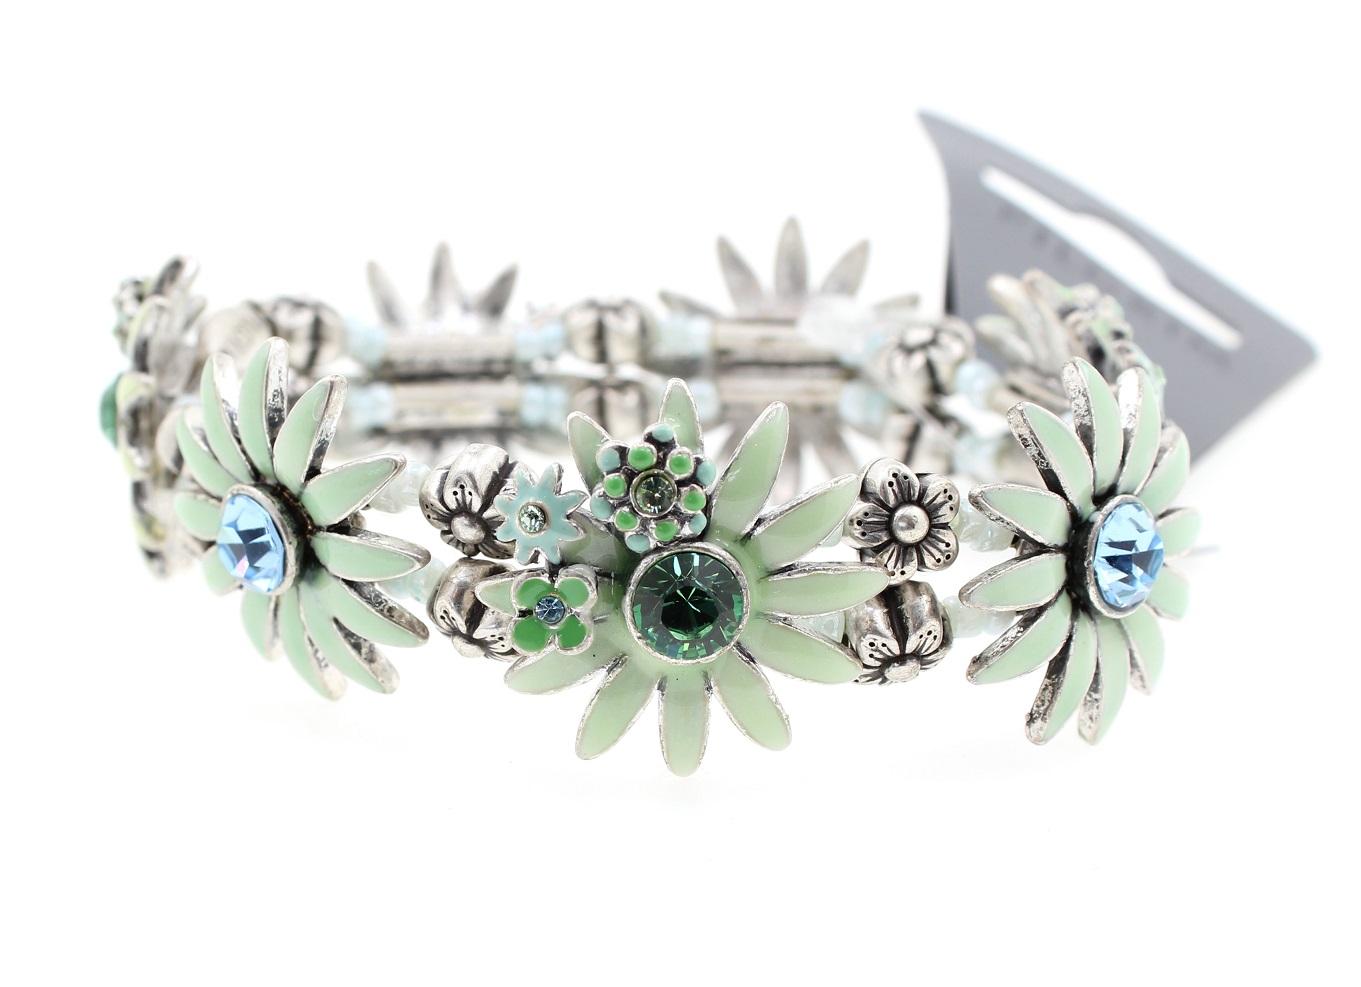 PILGRIM - Daisy - Stretch Bracelet - Oxidised Silver Plate/Green BNWT